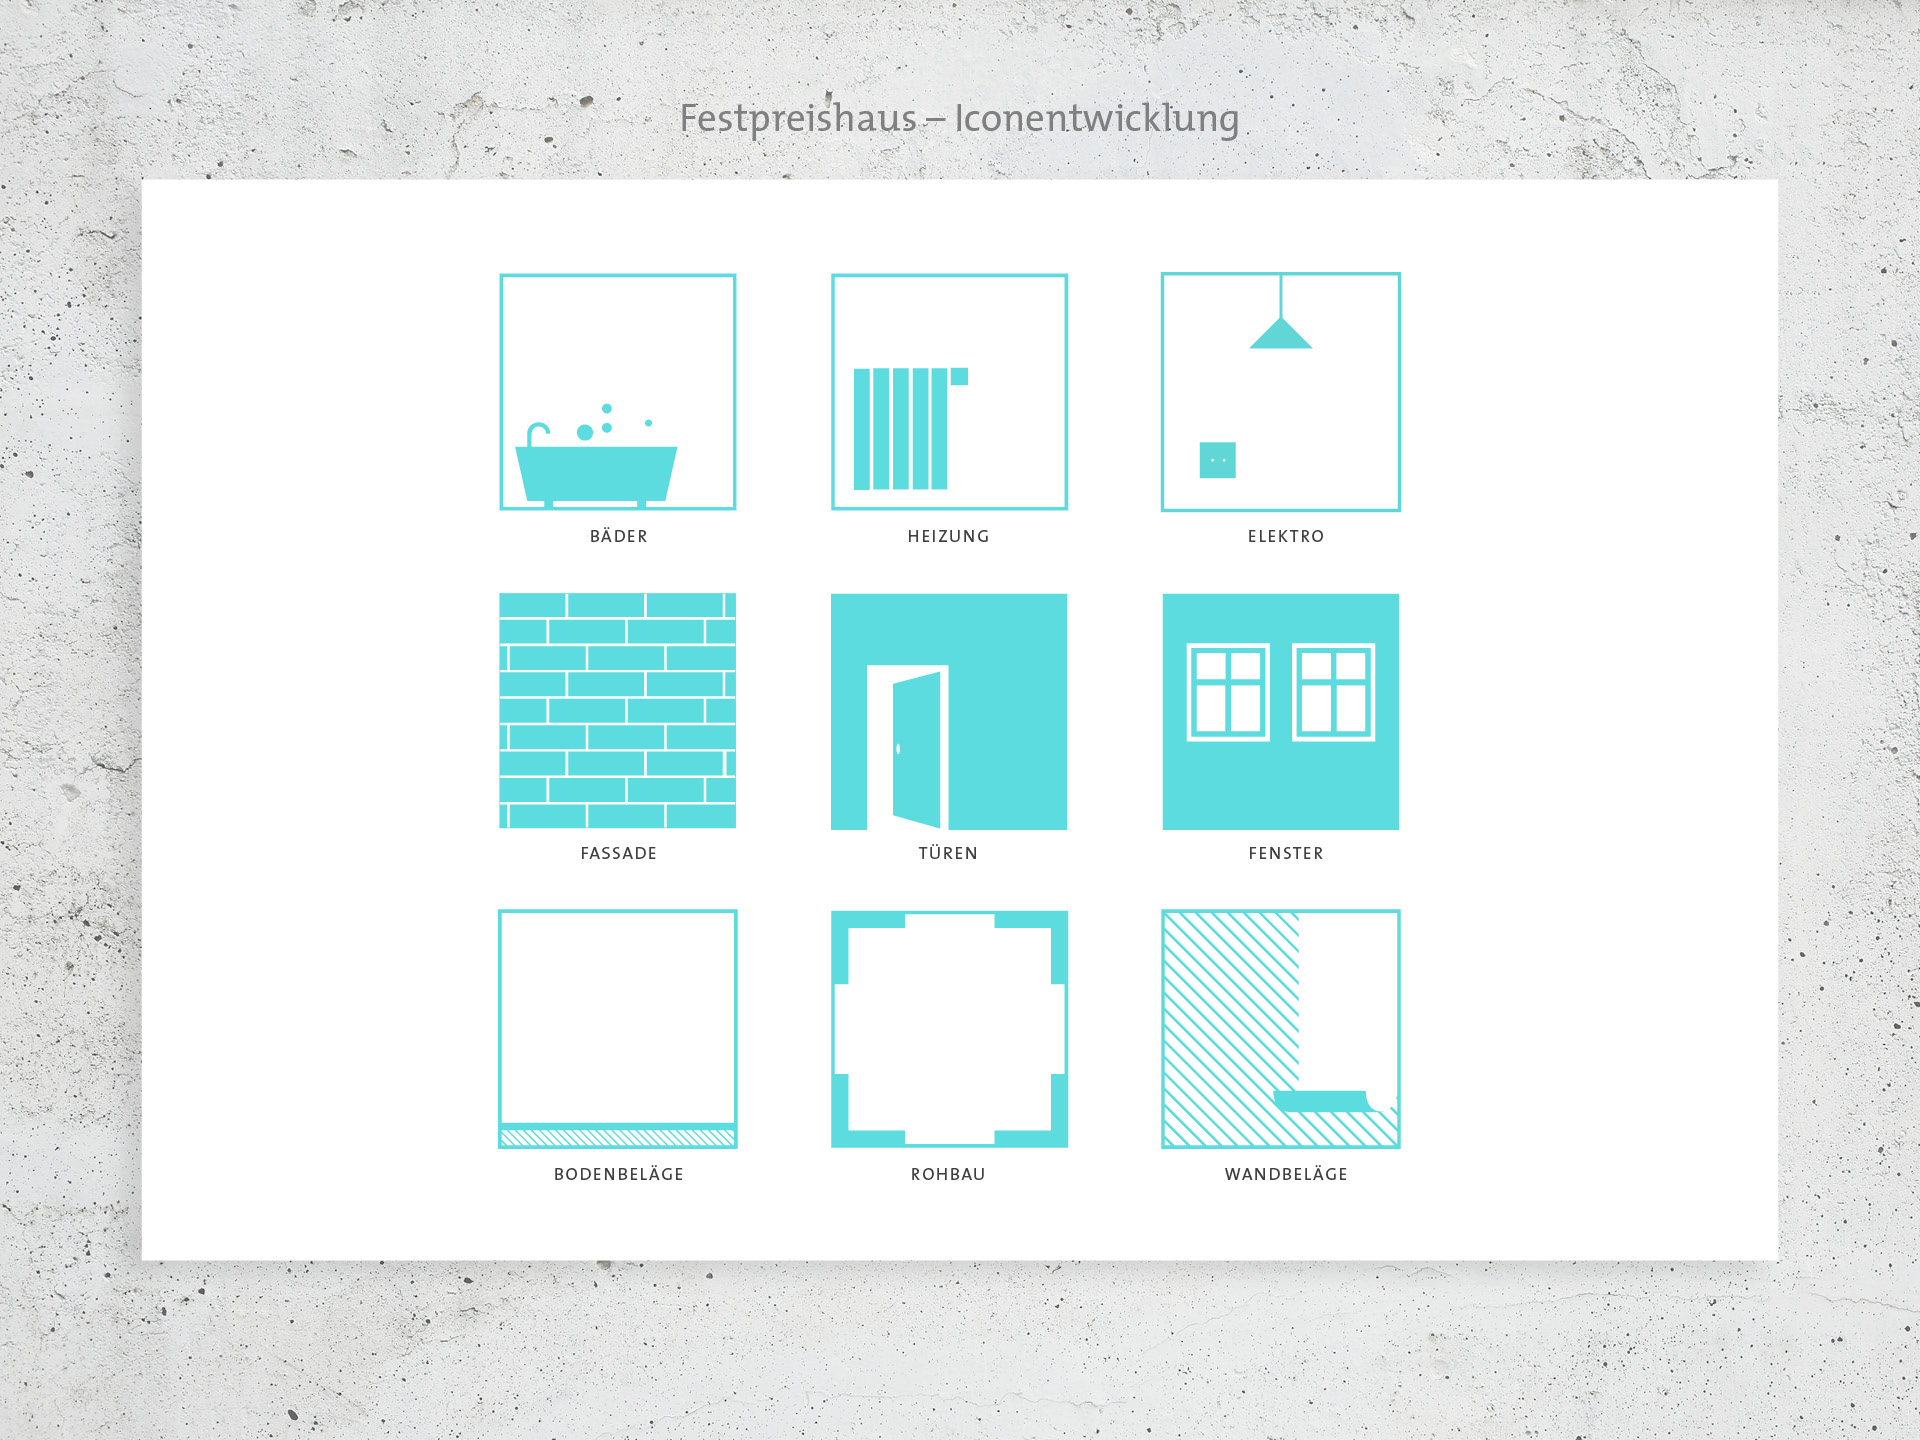 Corporate-Design Logo Grafik Festpreishaus Design Konzept Studio Auckz